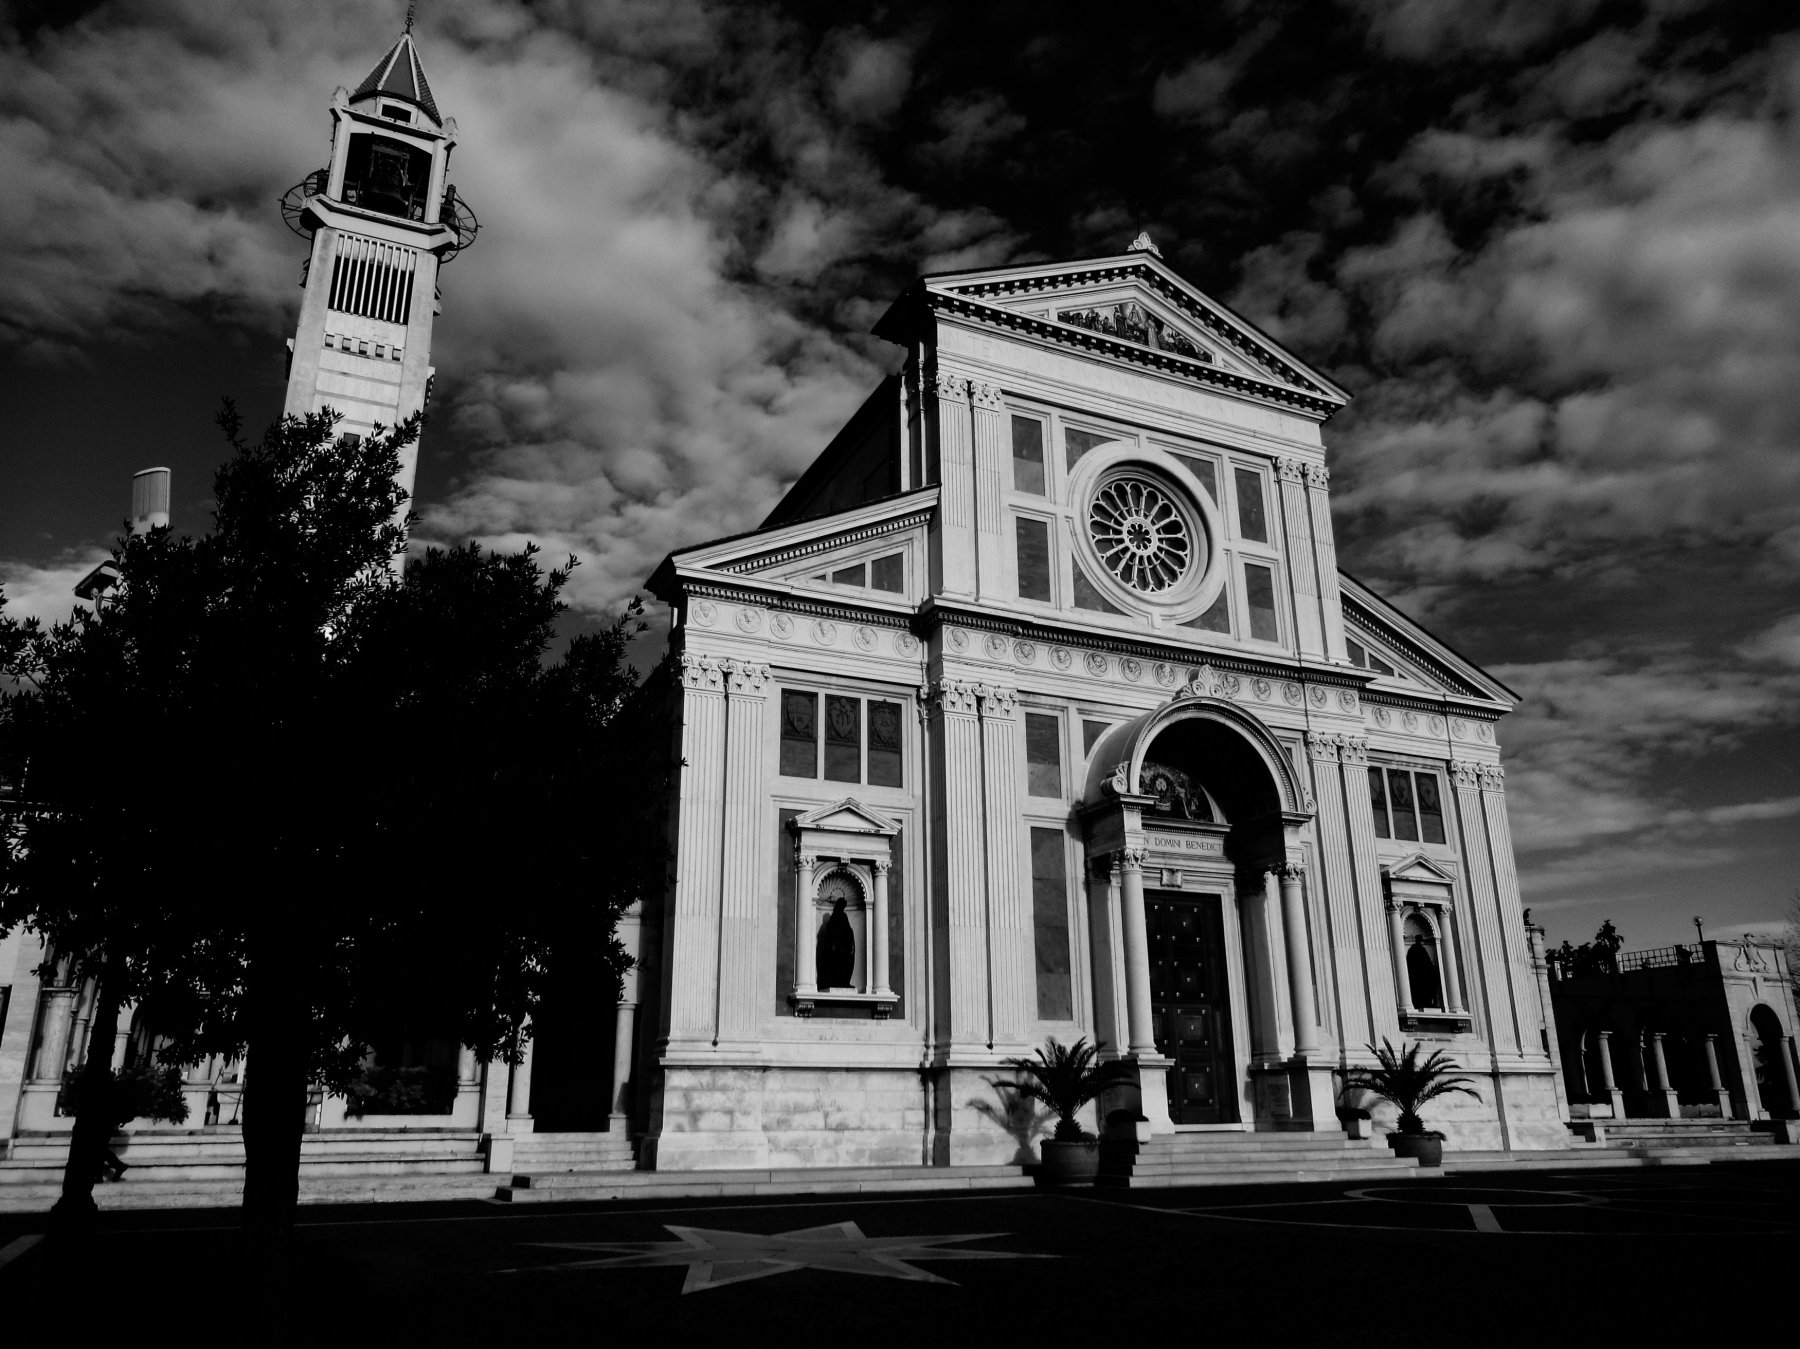 Santuario del Banbino Gesù di Praga